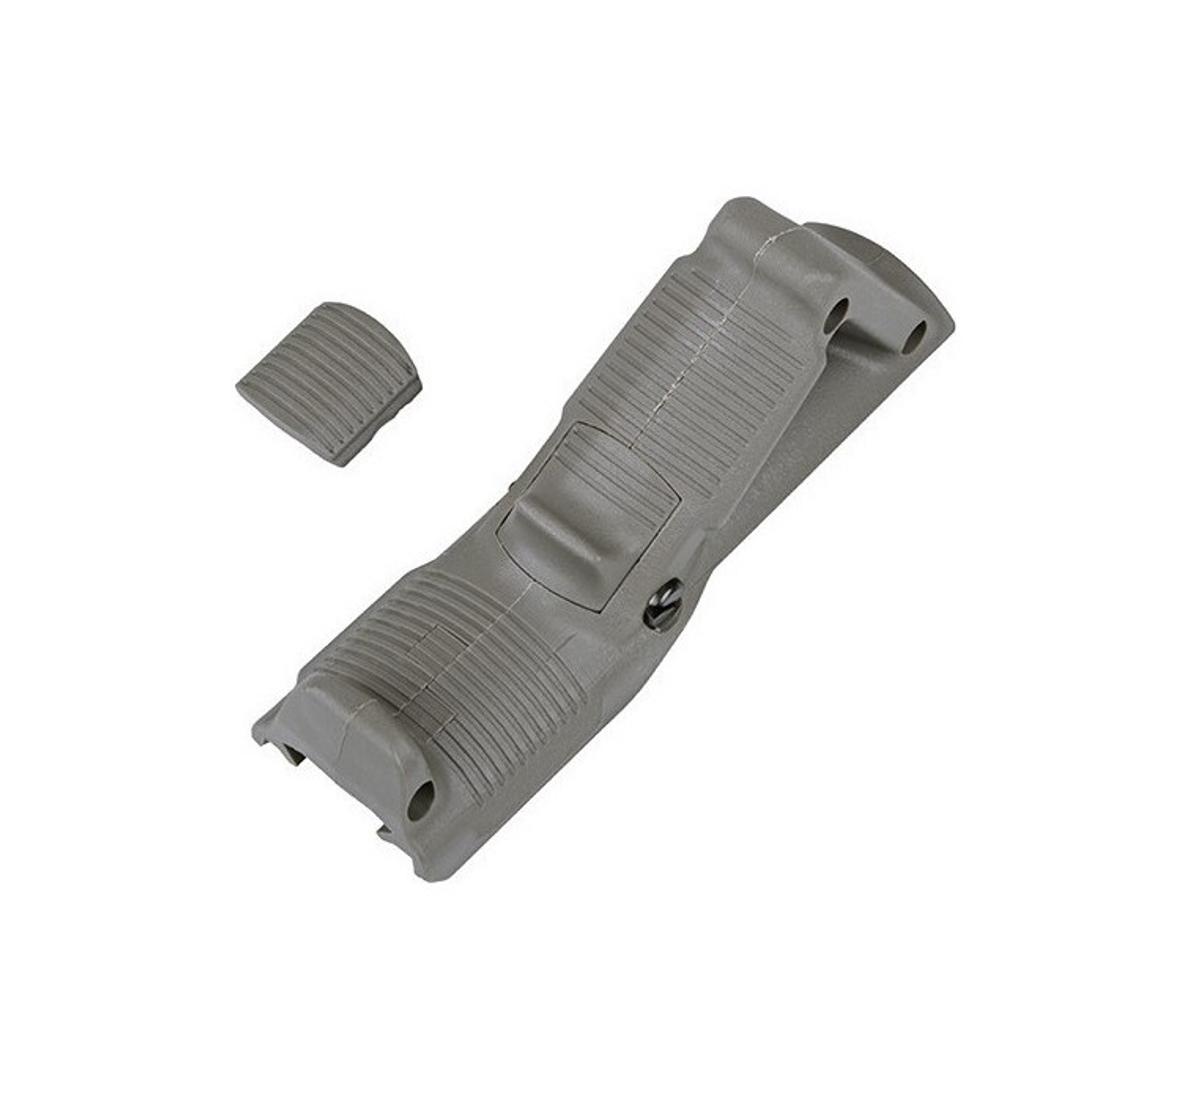 Angular Front Grip FFG-1 - Olive Drab